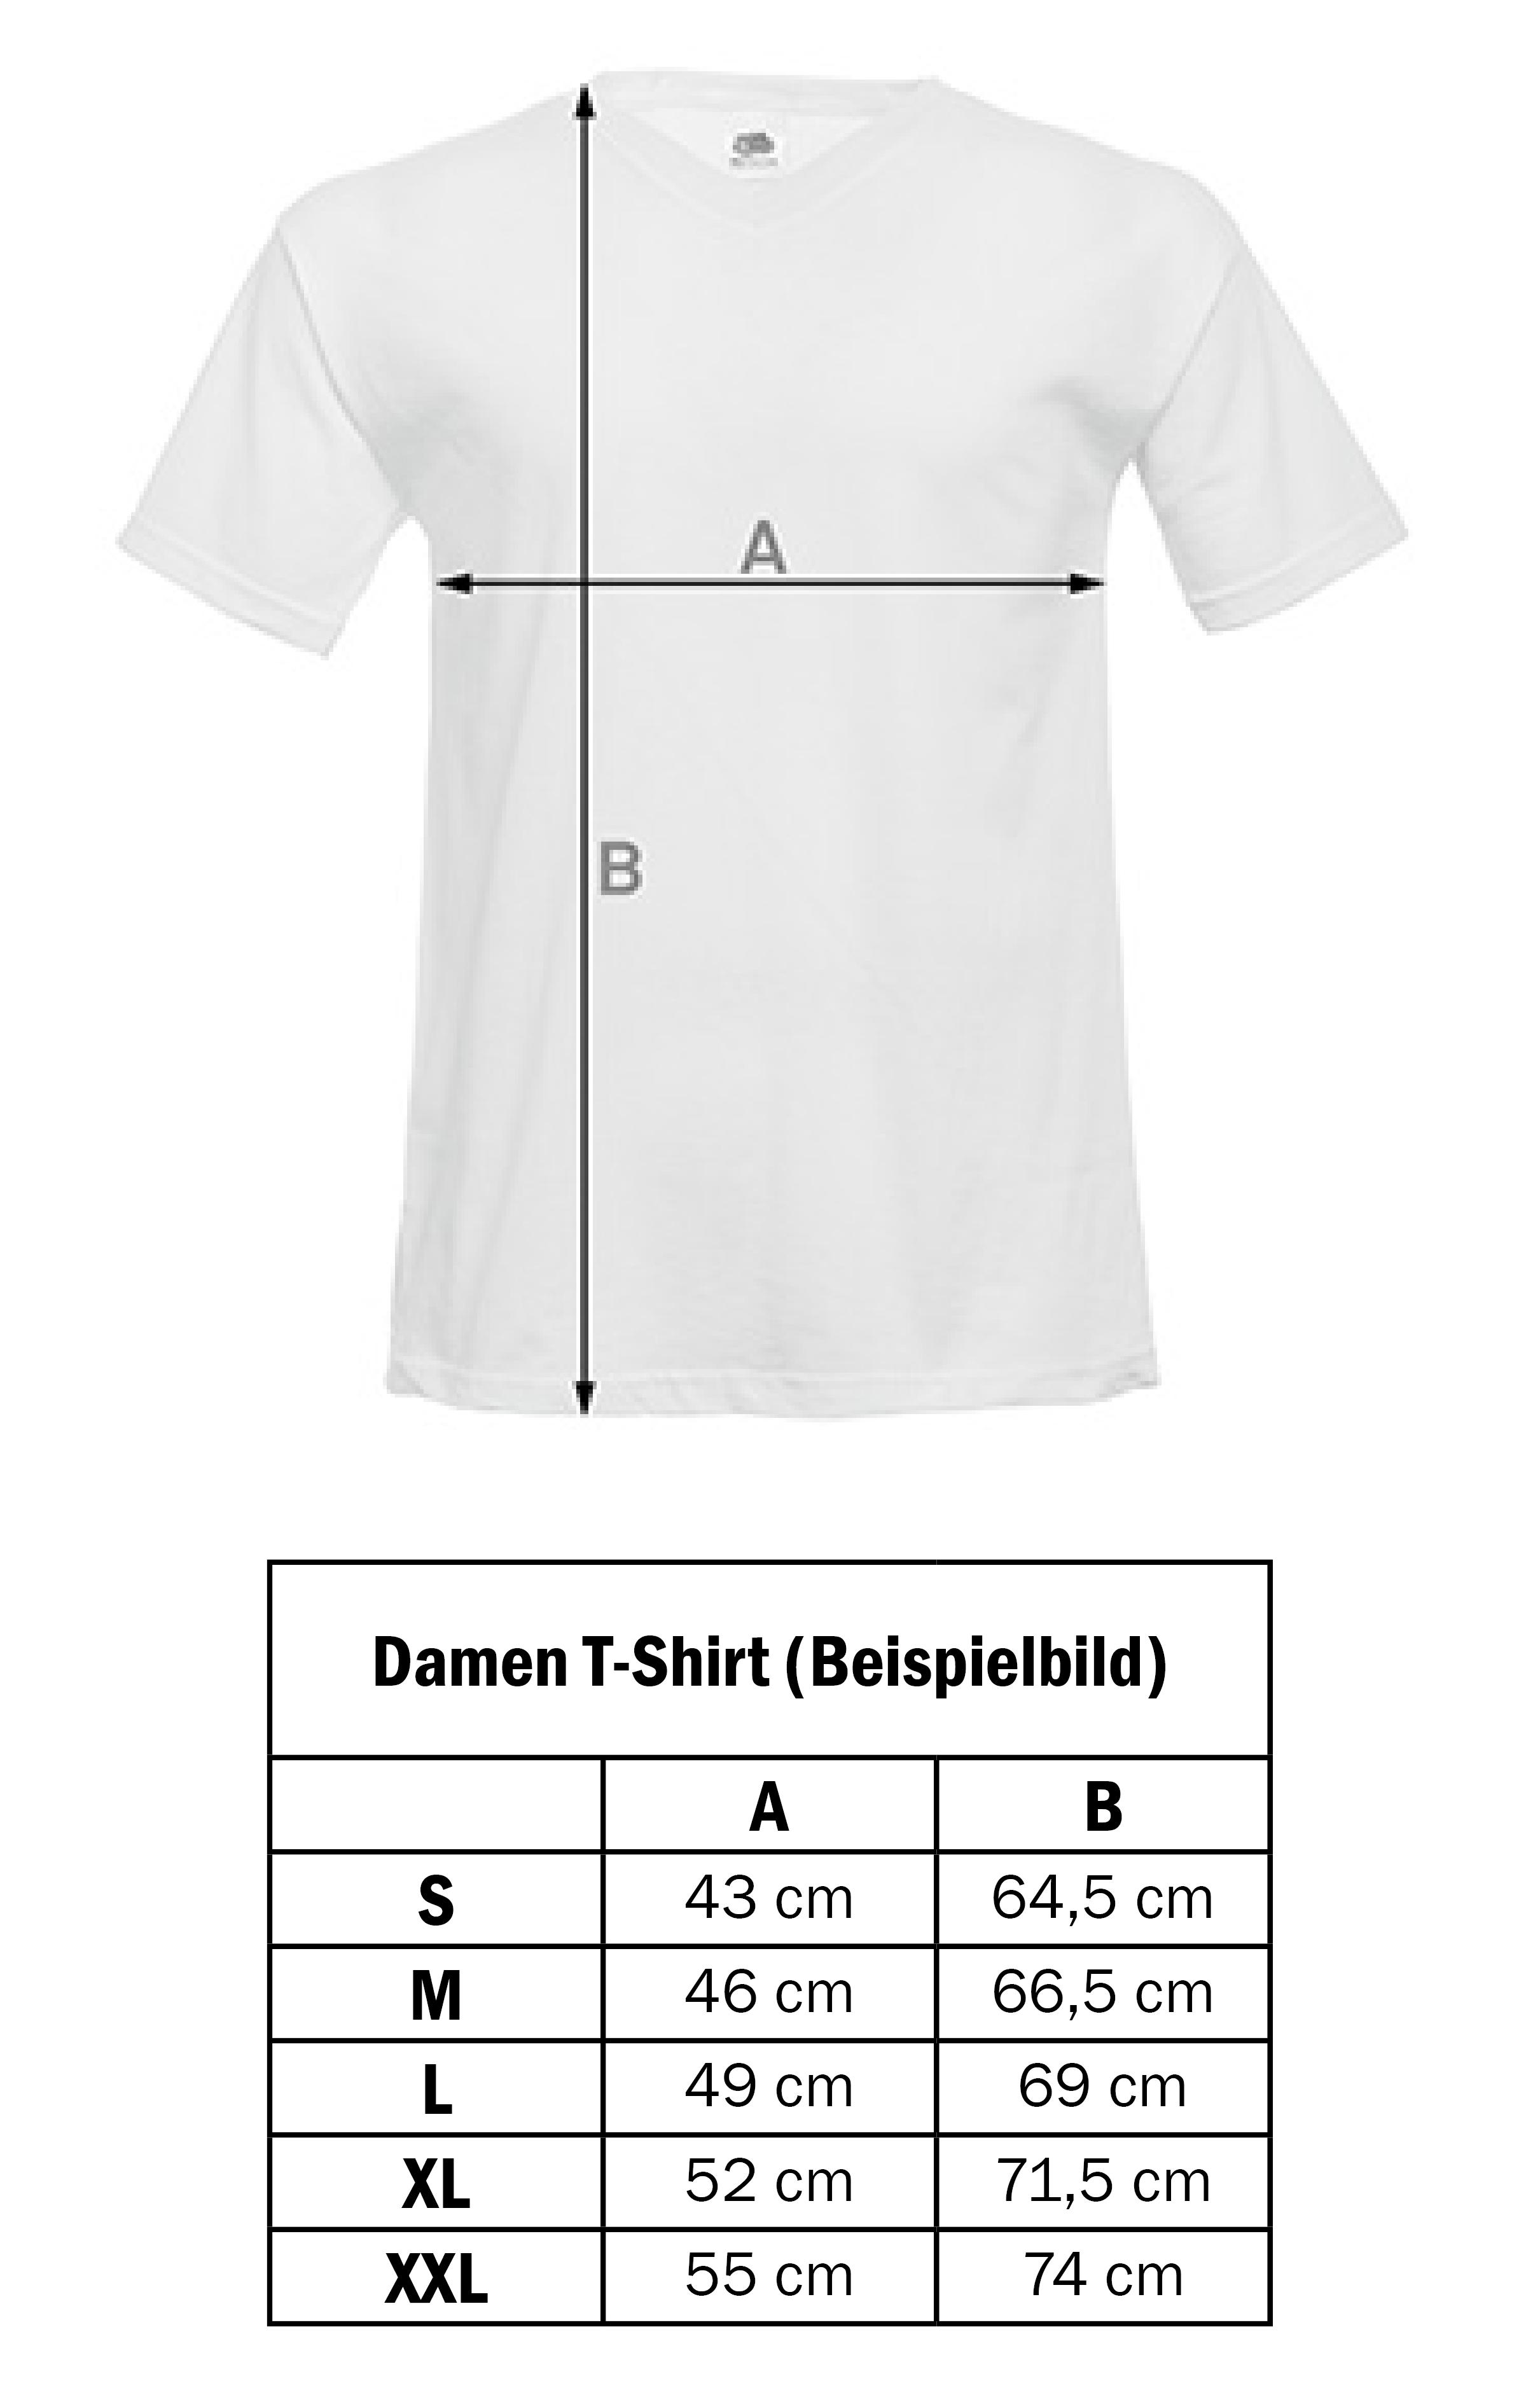 Gr-ssentabelle_Damen_Tshirt